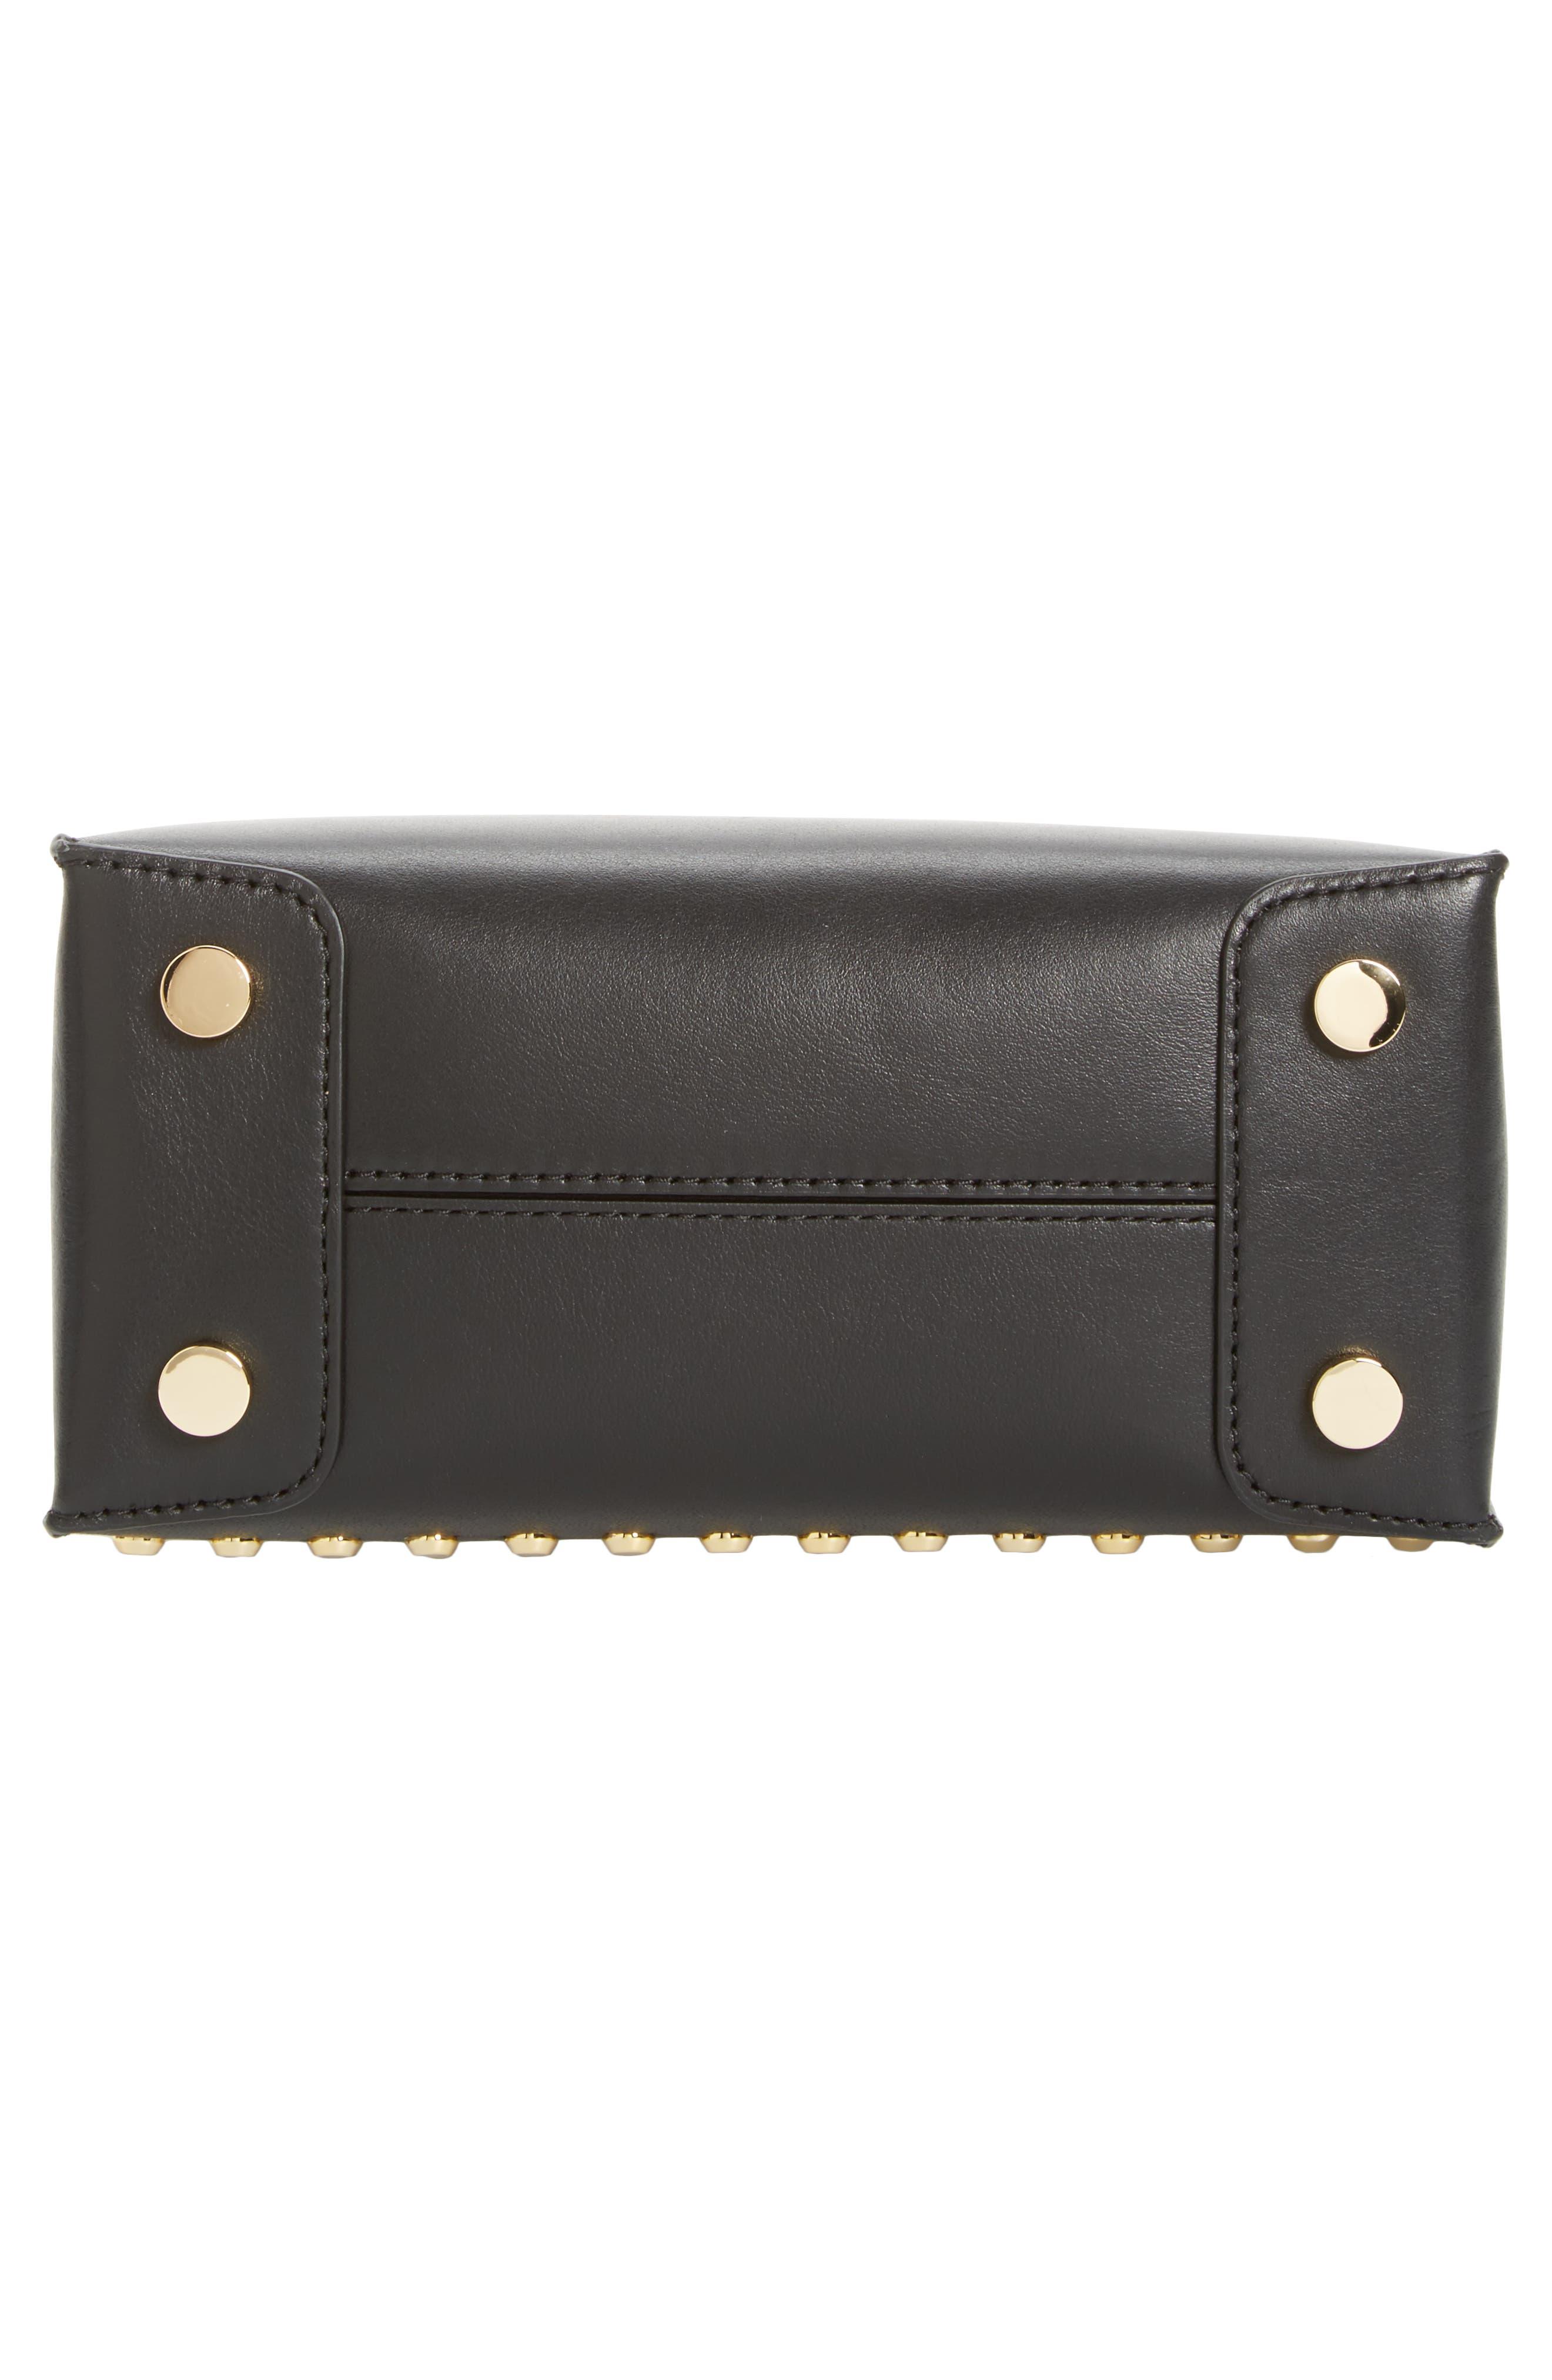 Medium Mercer Studded Leather Tote,                             Alternate thumbnail 6, color,                             001